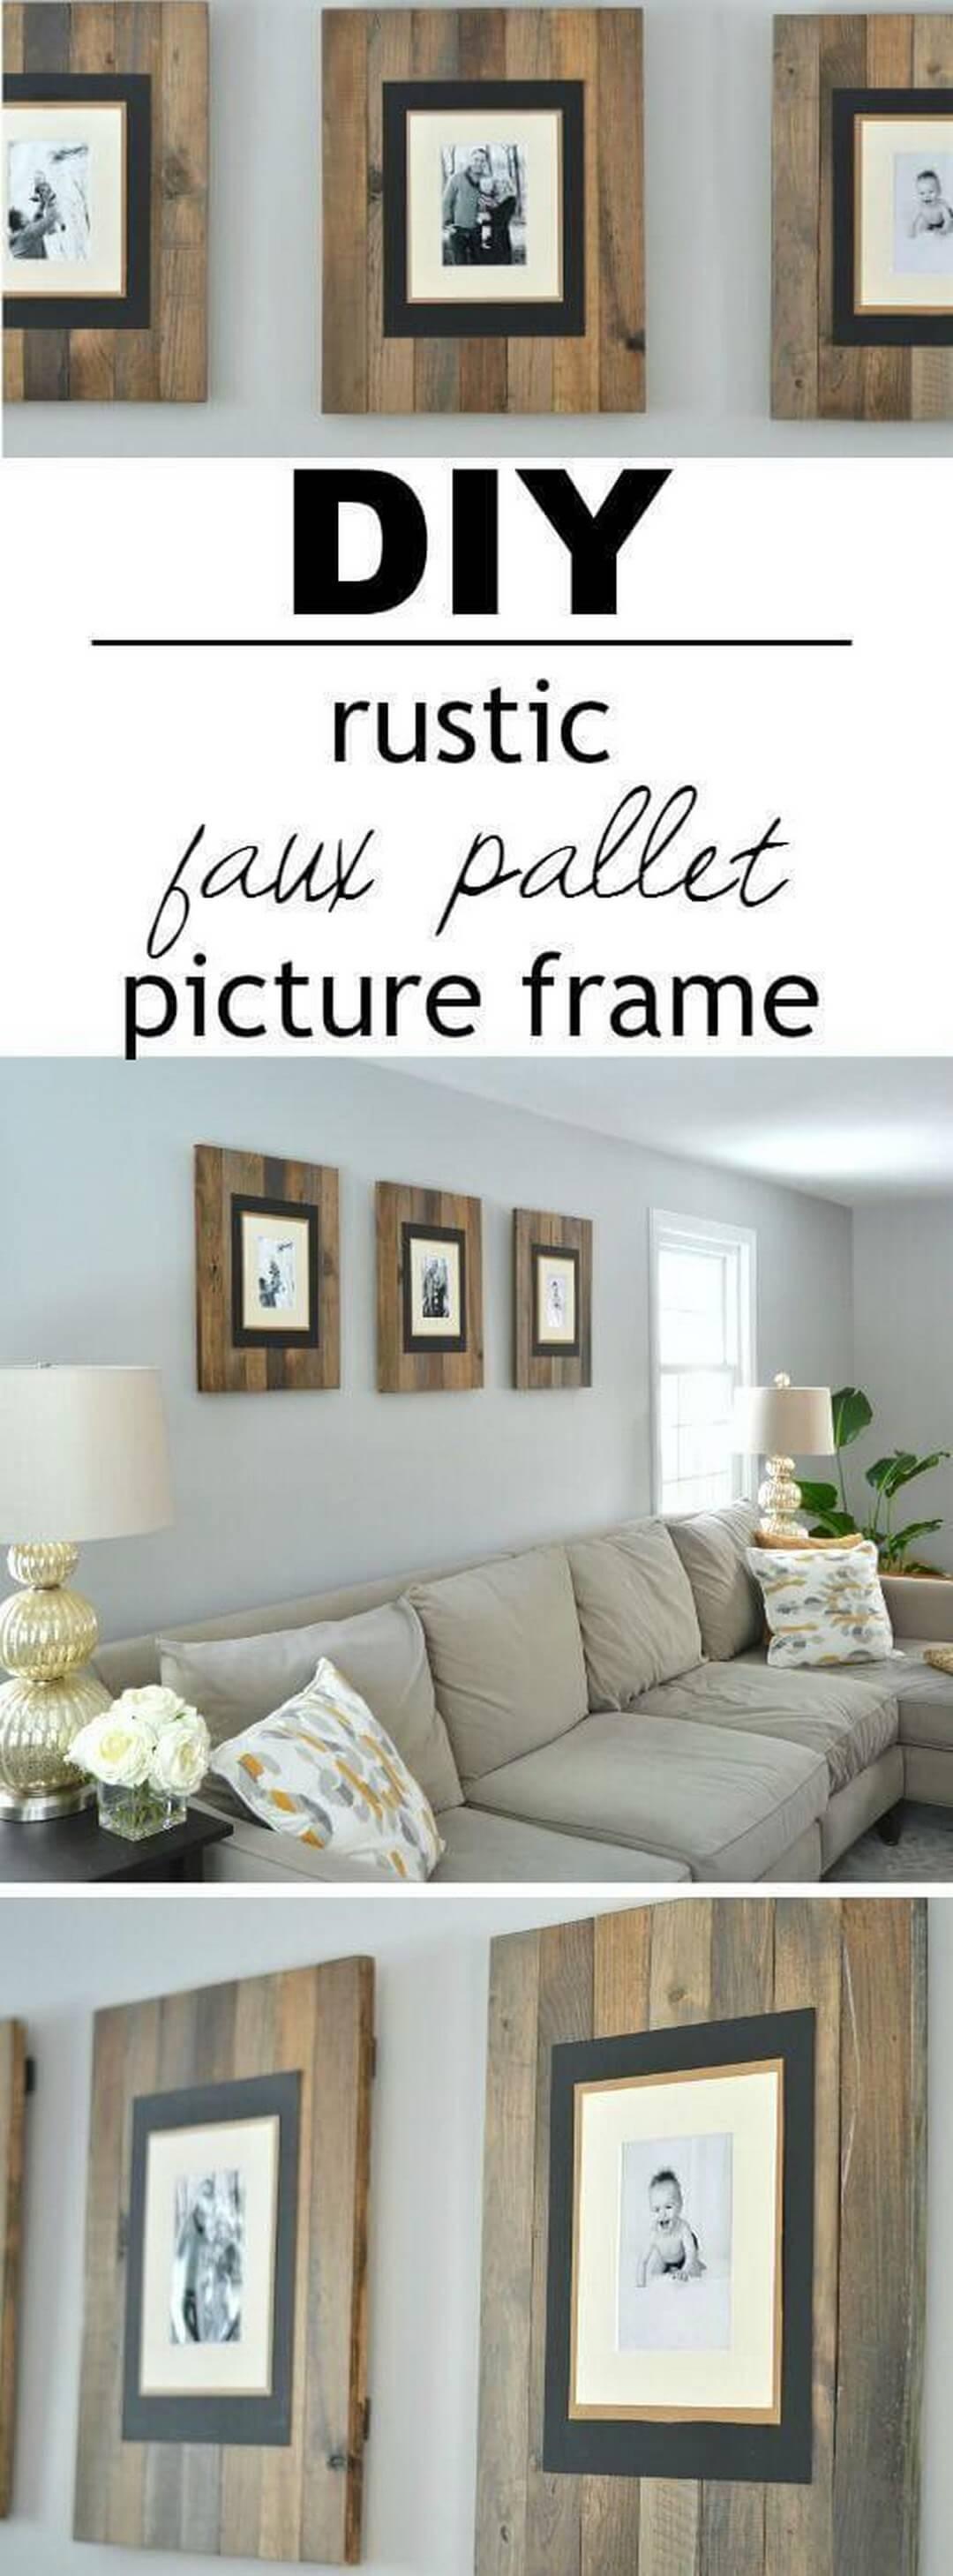 24 rustic living room wall decor ideas homebnc